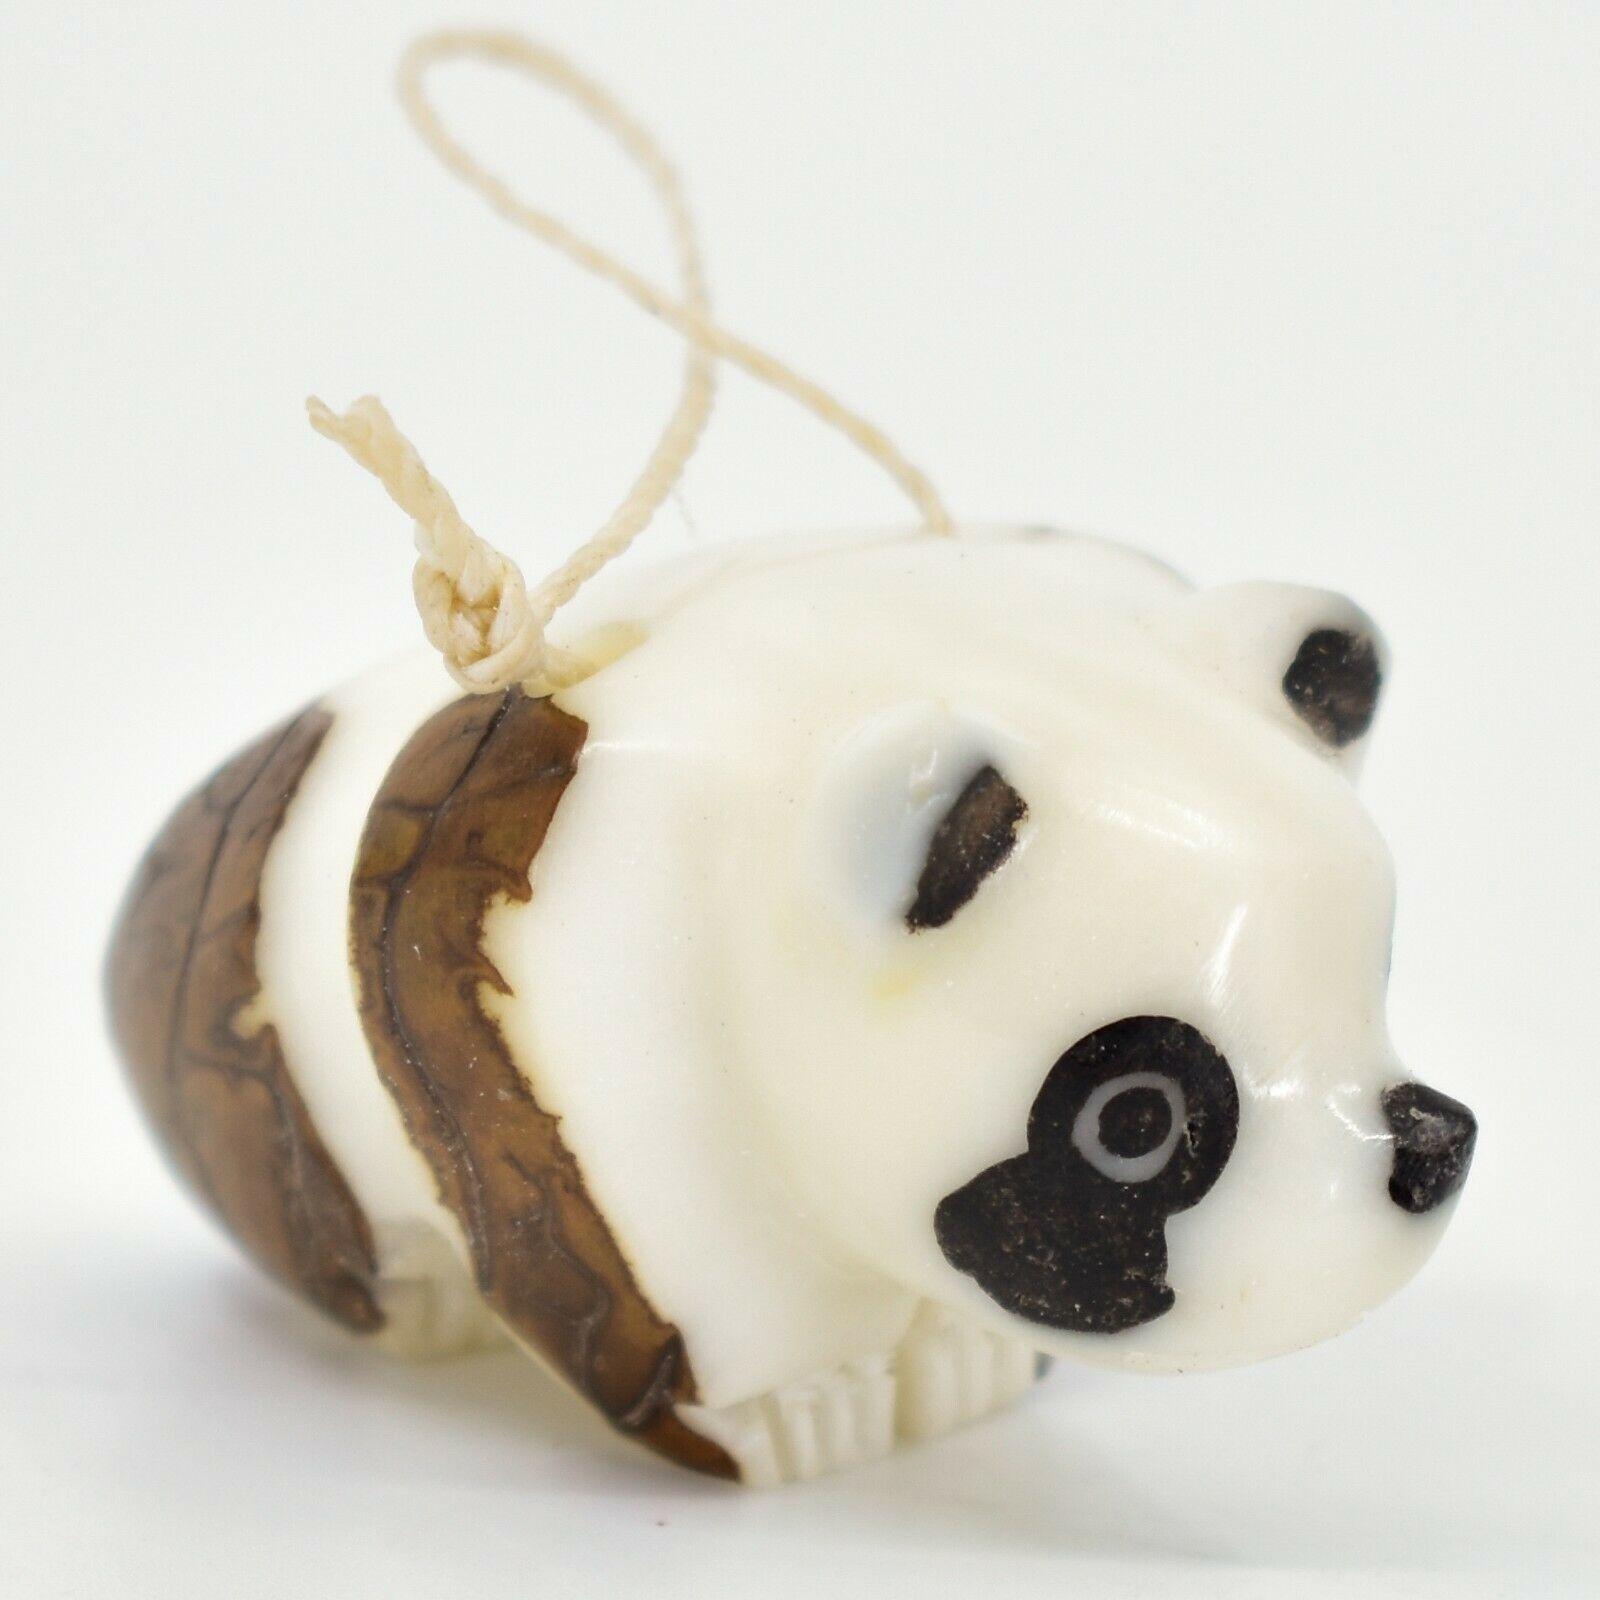 Hand Carved Tagua Nut Carving Panda Bear Hanging Ornament Handmade in Ecuador